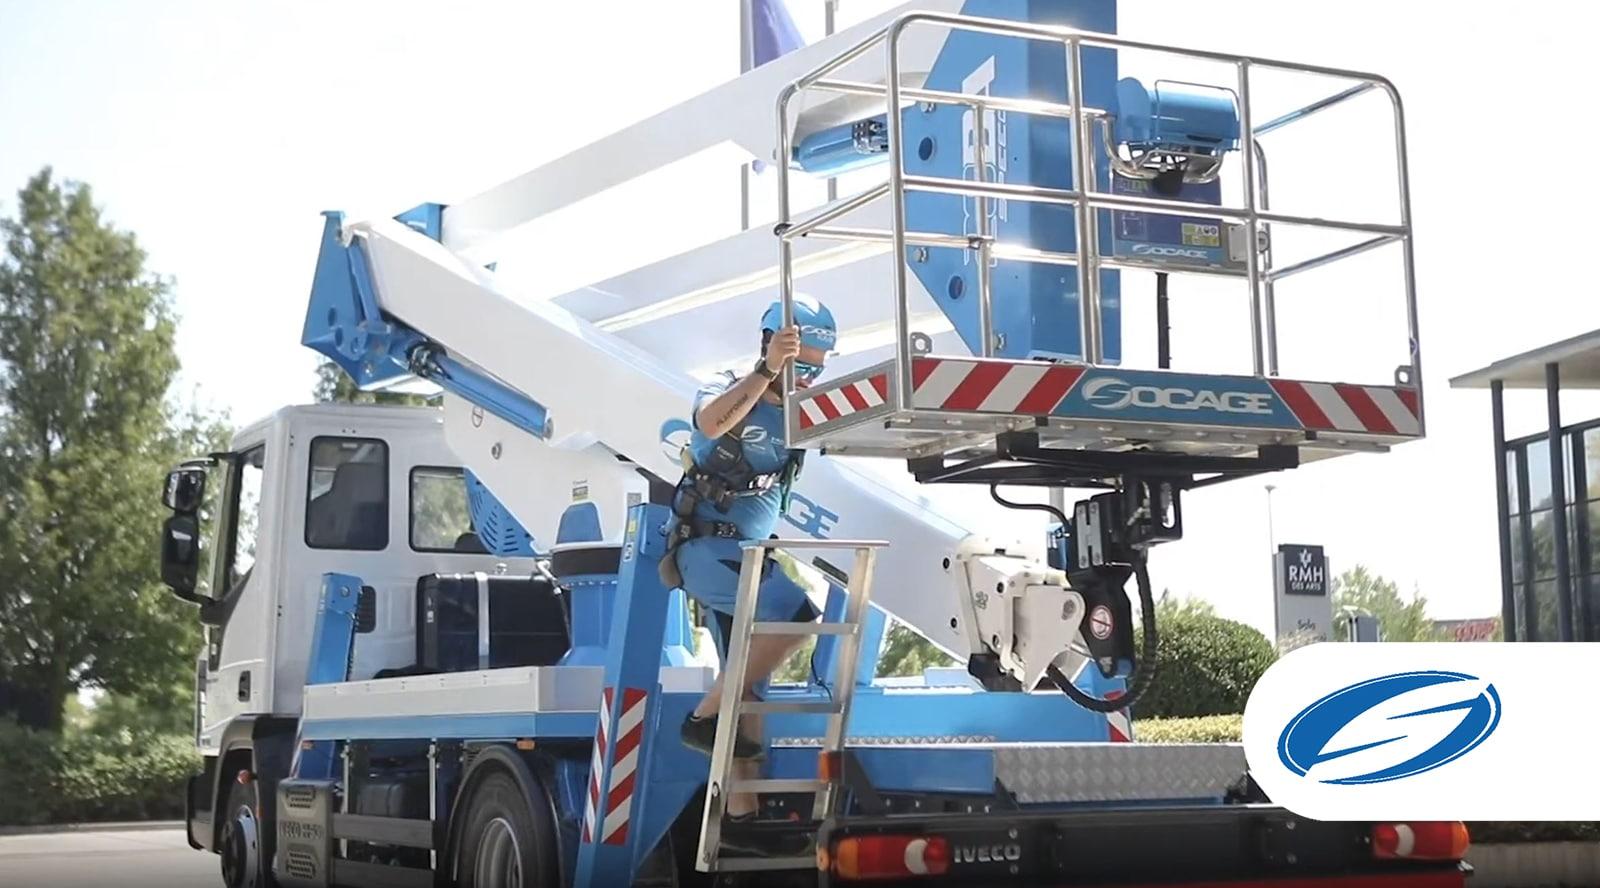 Camion con piattaforma aerea 28DA SPEED cestello